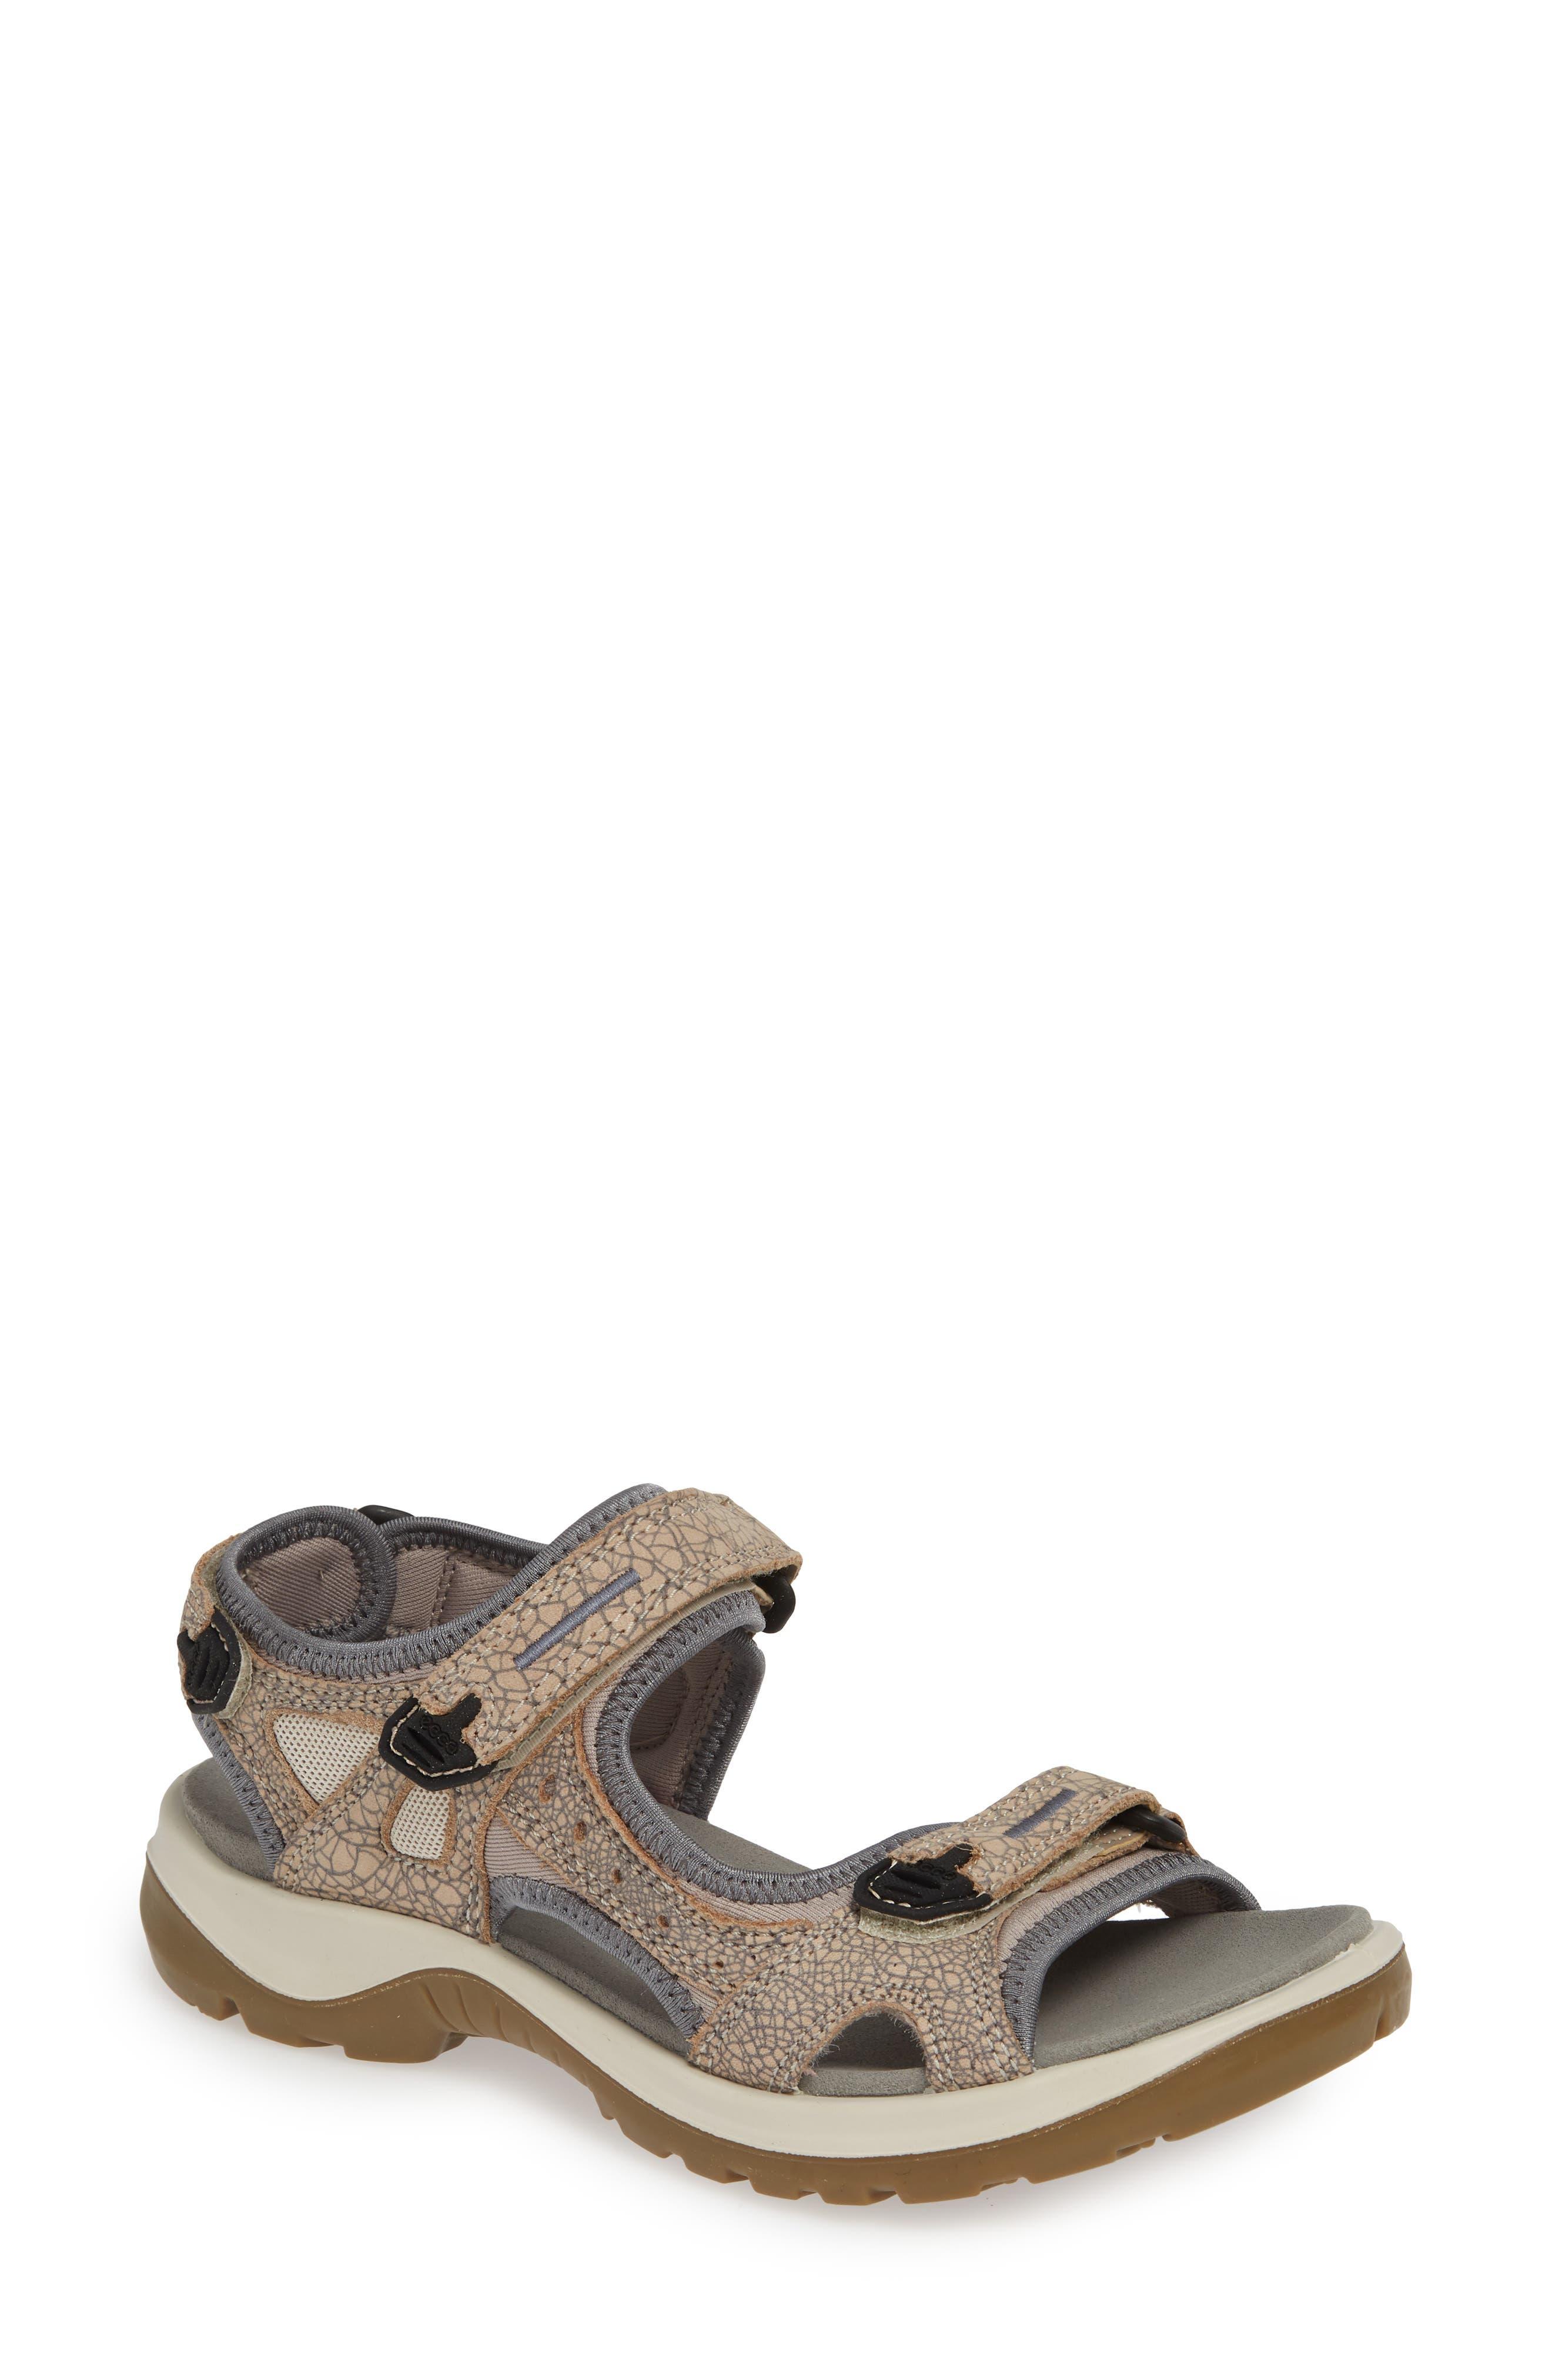 Ecco Yucatan Sandal, Beige